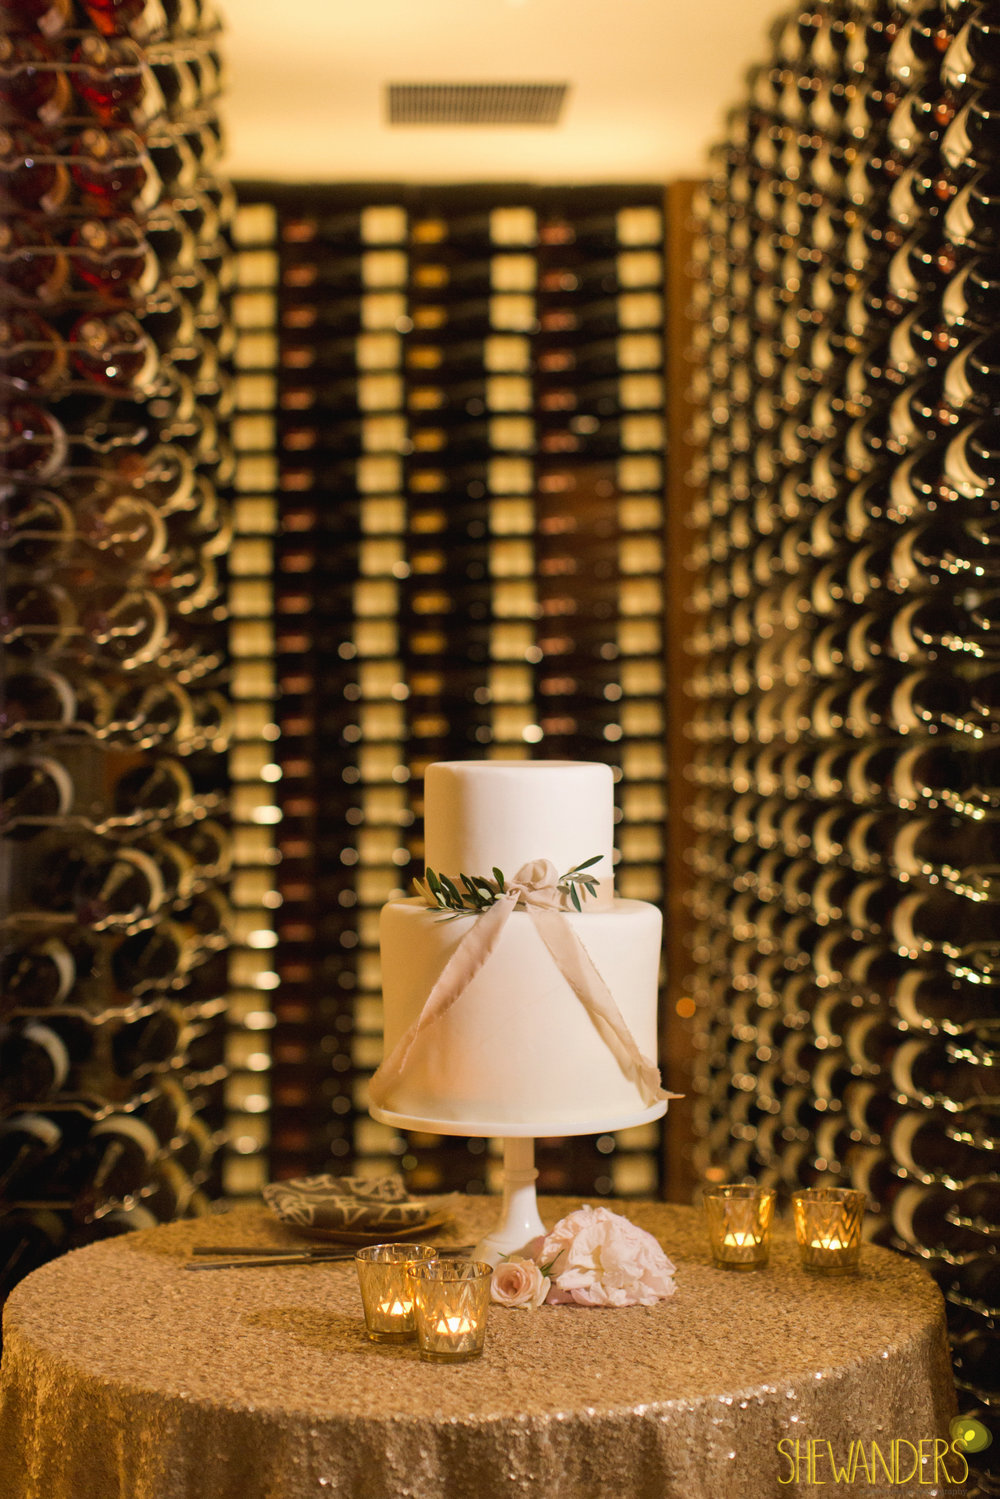 1105.Shewanders.TammiWalter.Wedding.SanDiego_1115.jpg.TammiWalter.Wedding.SanDiego_1115.jpg